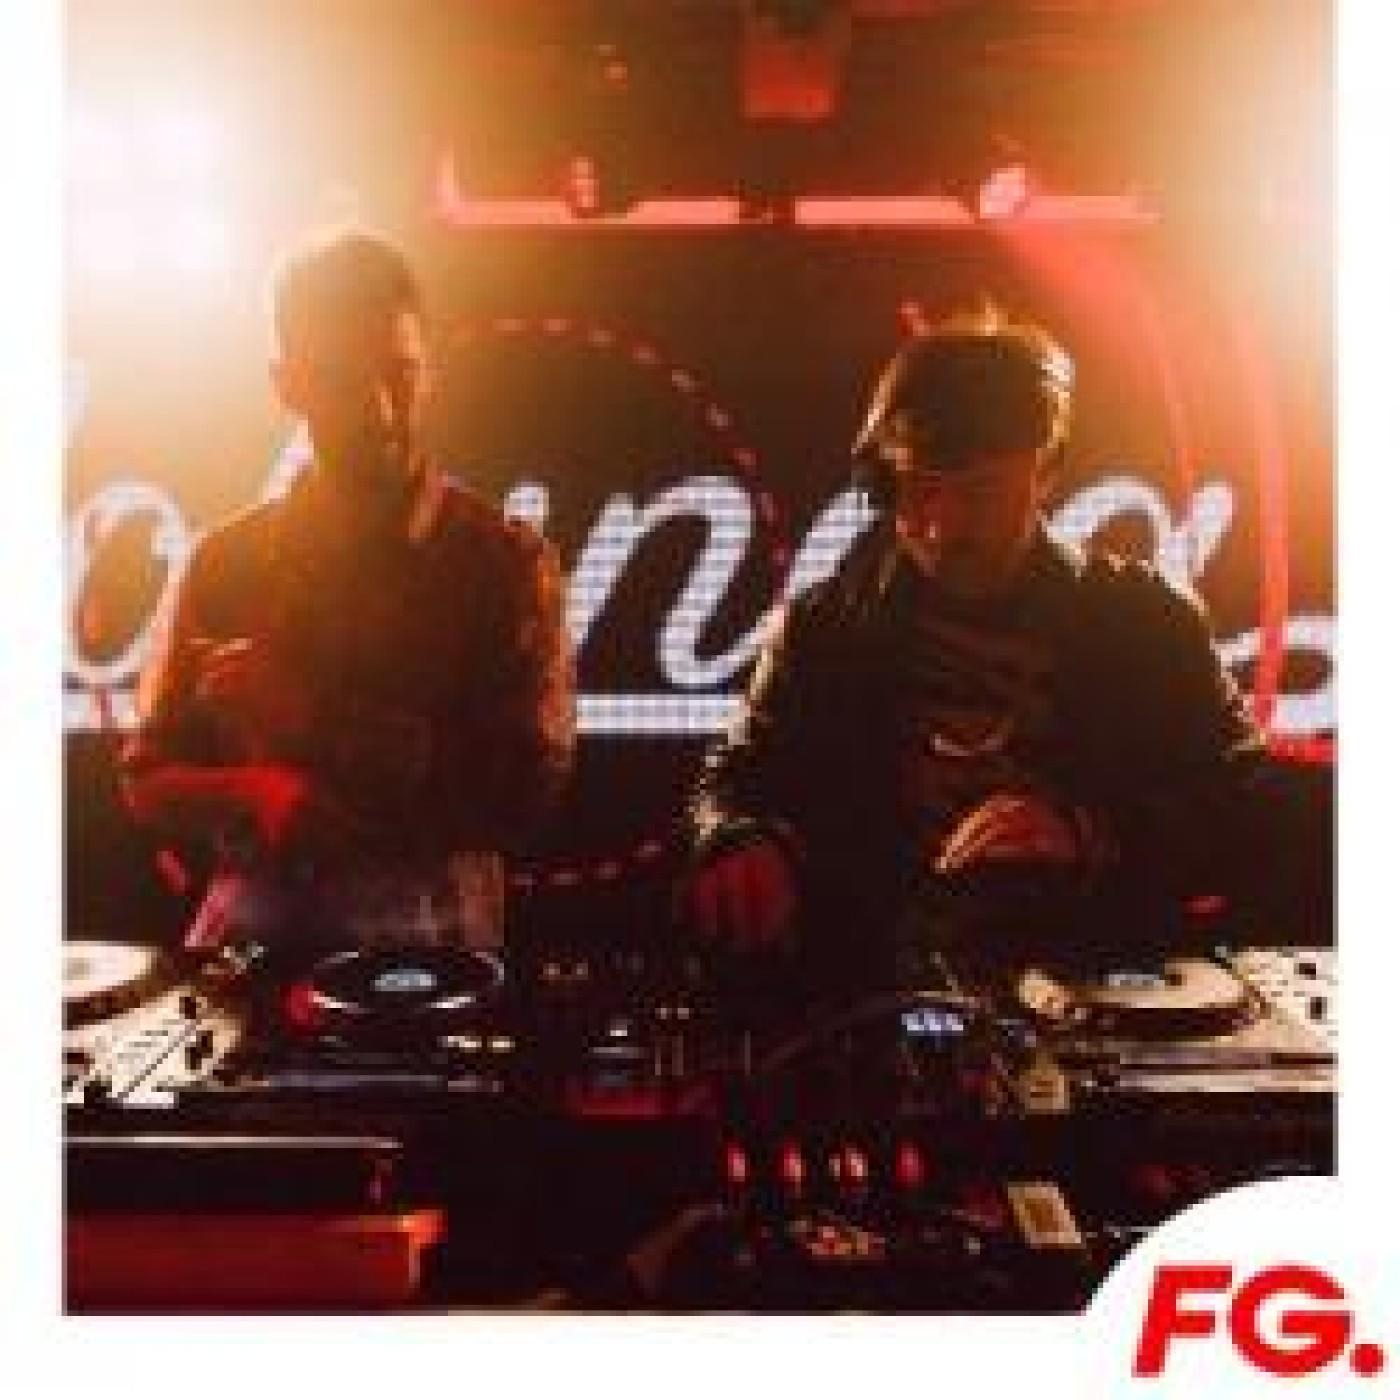 CLUB FG : YOLANDA BE COOL